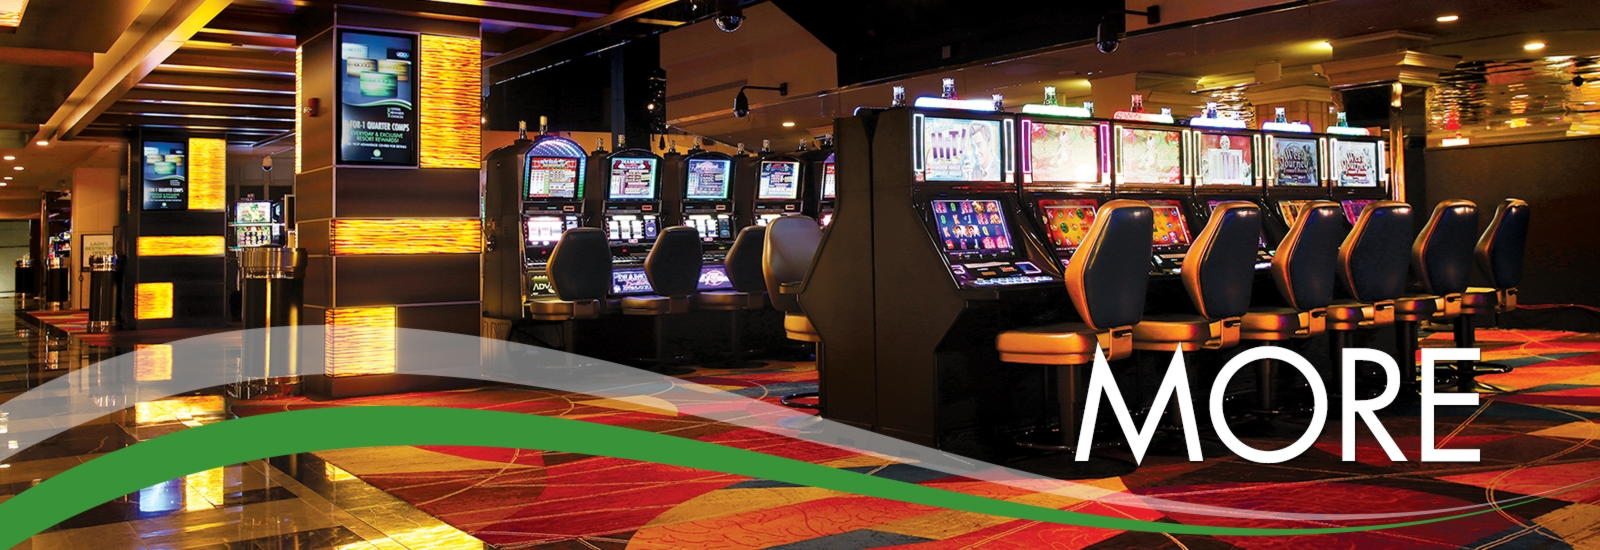 EURO 860 Daily Freeroll slot մրցաշարում Video Slots- ում